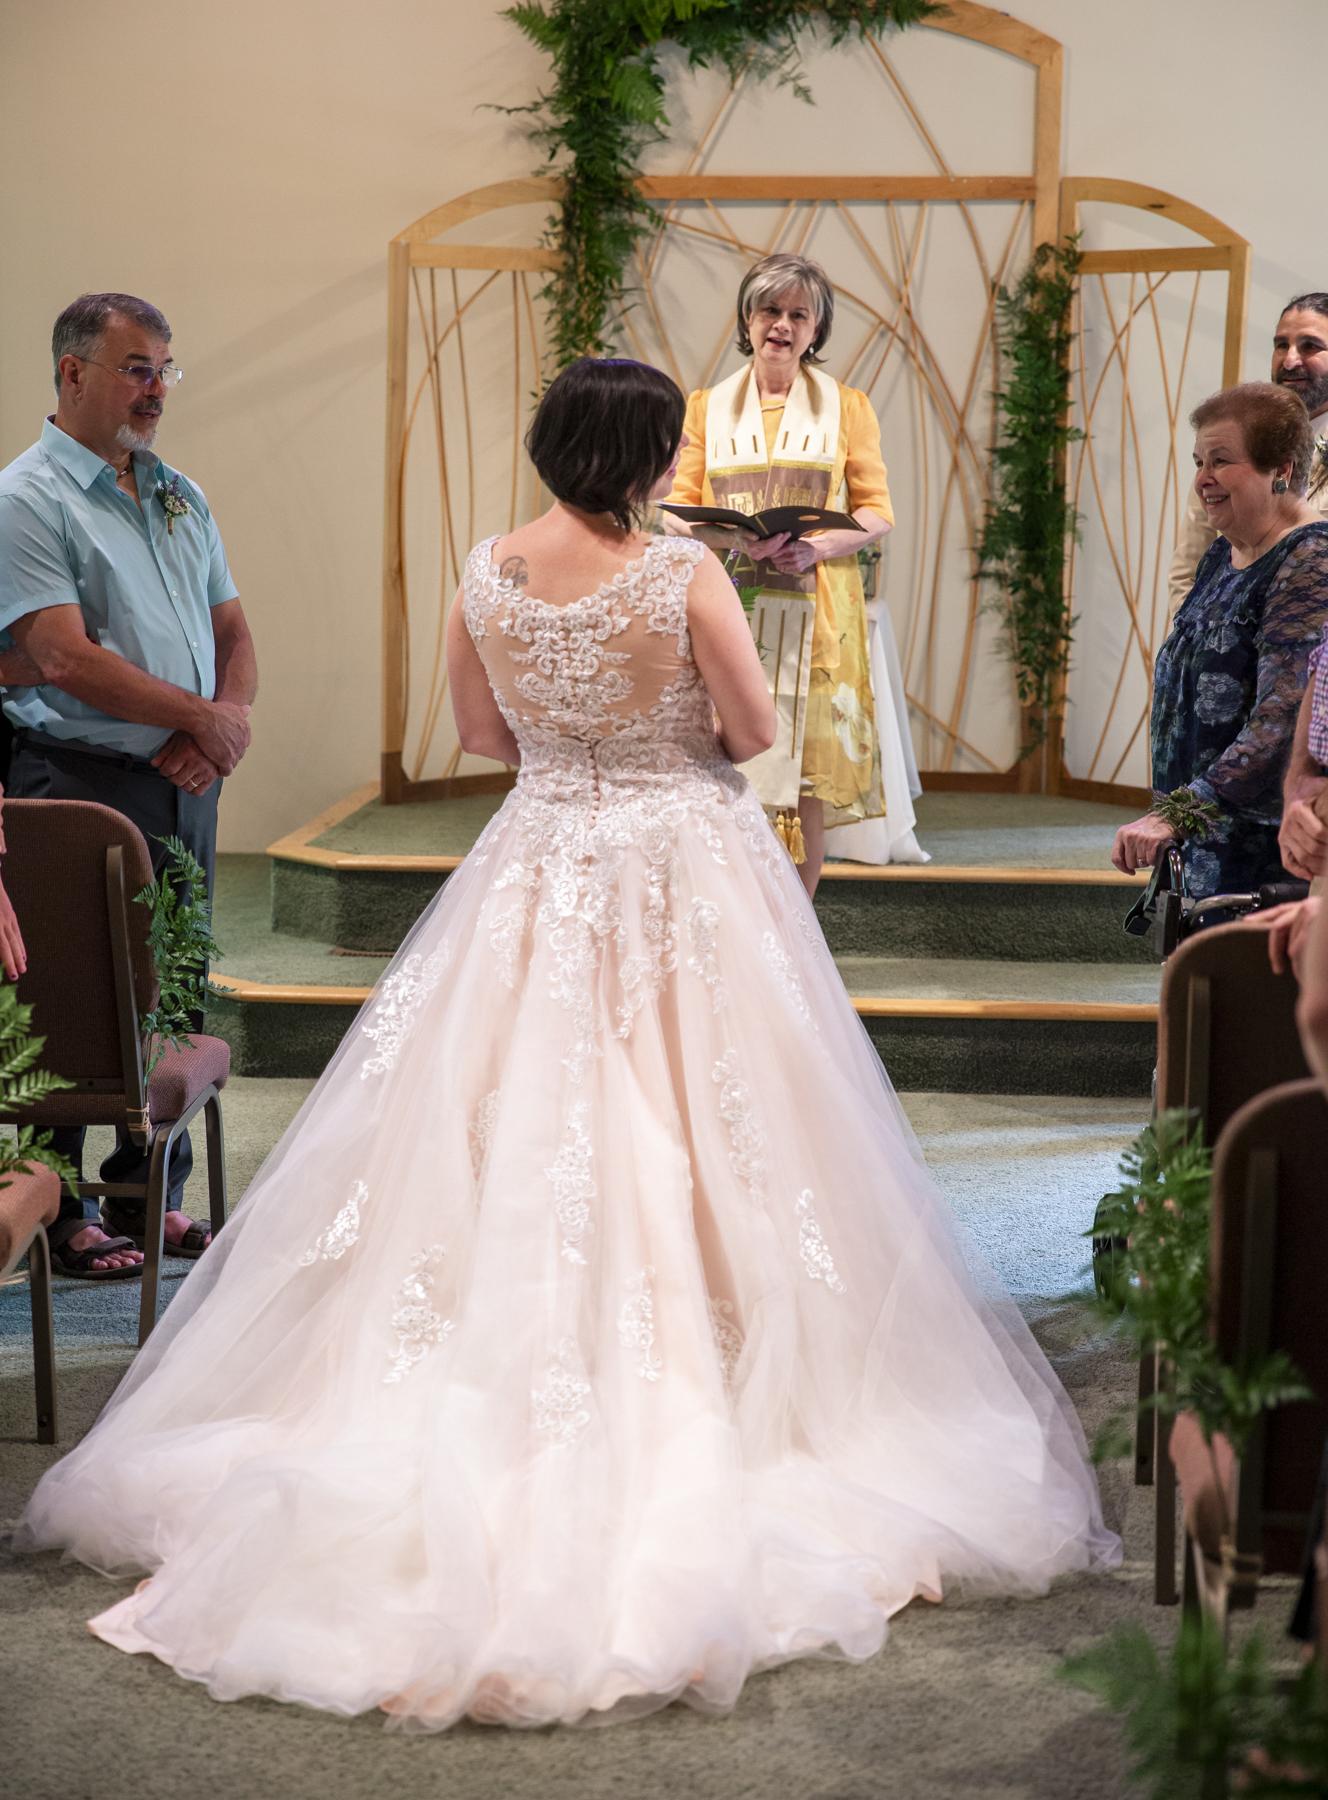 Avyanna and Phoenix Wedding- Photos by Studio Misha_BLOG-57.jpg